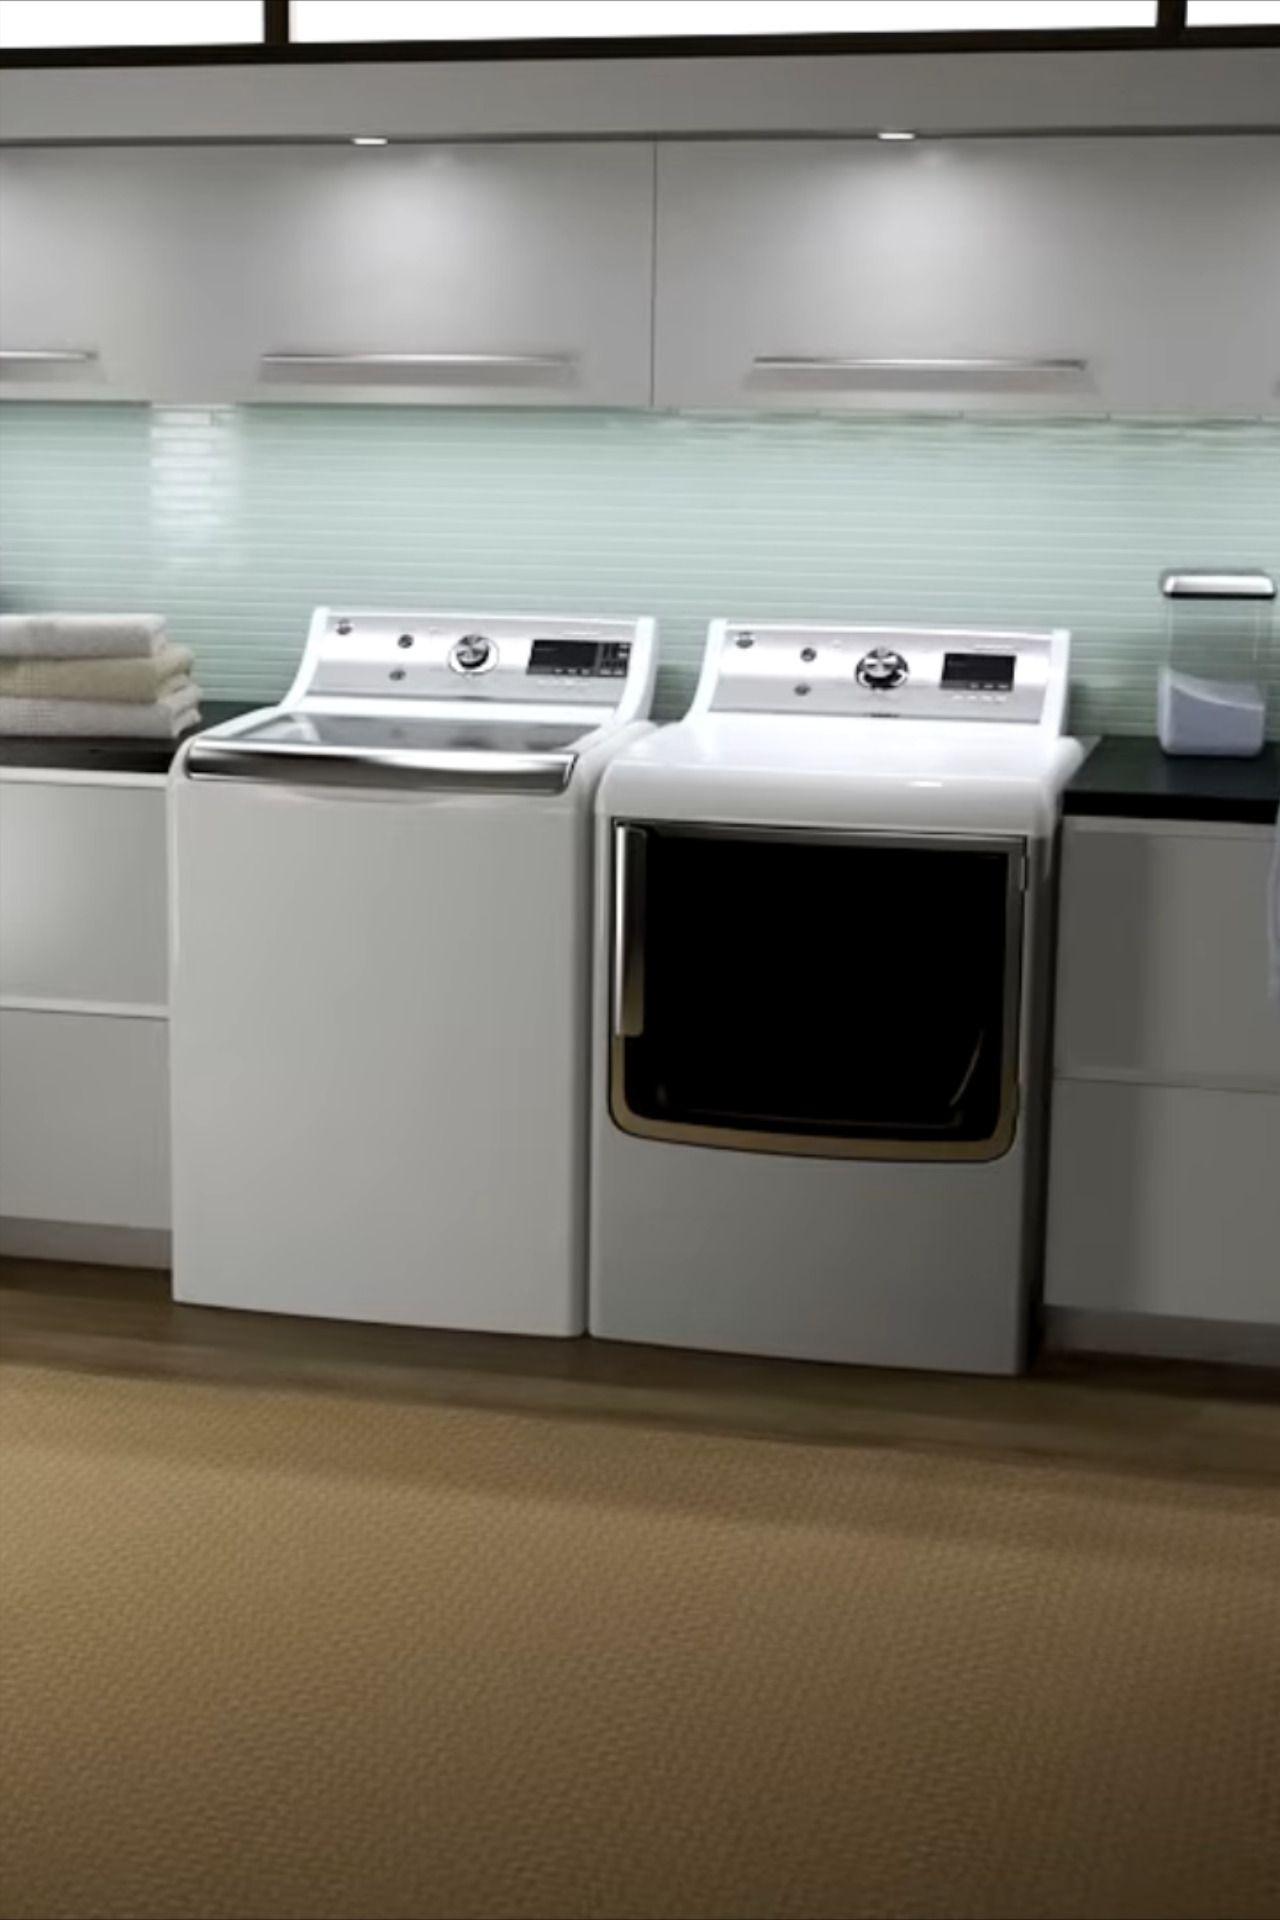 Washing Machine Hoses Washing Machine Drain Hose Washing Machine